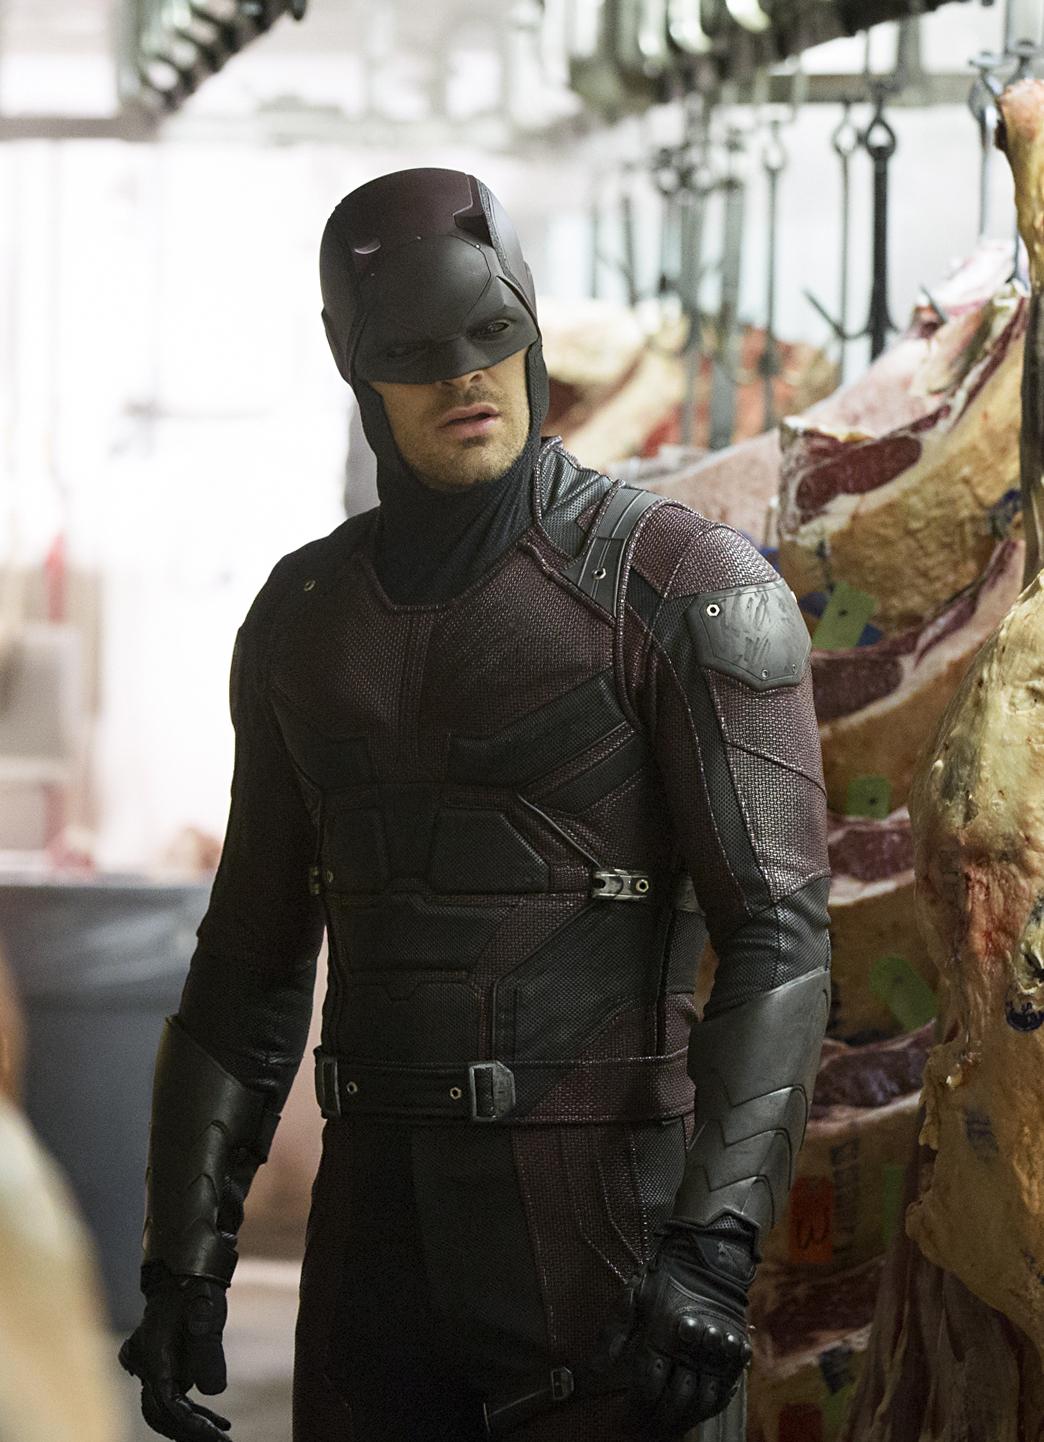 Daredevil Season 2 First Look: Elektra Looks Classy For Netflix's Storyline #35417